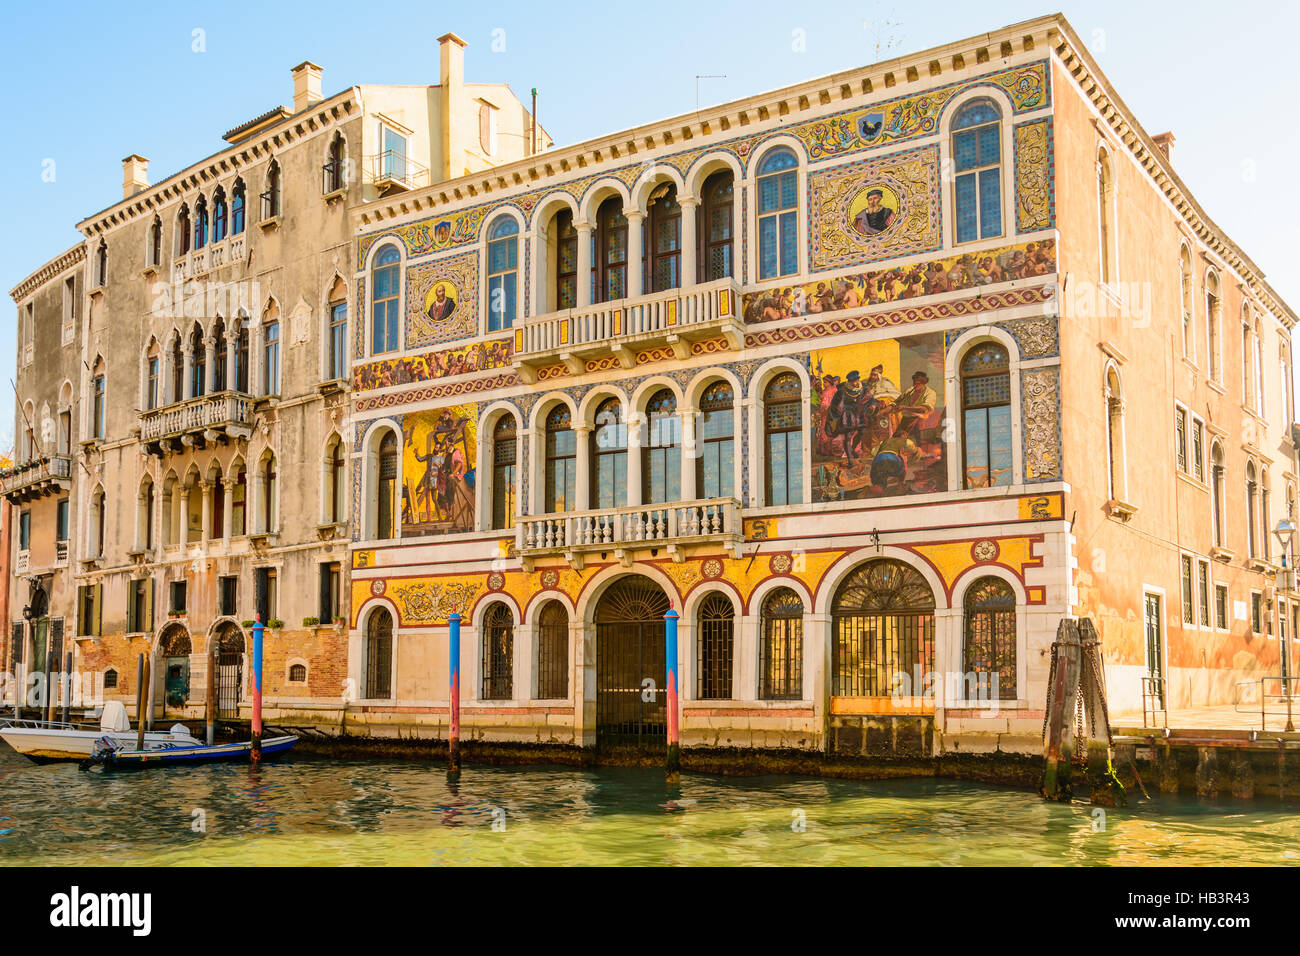 Palazzo in Venedig - Stock Image